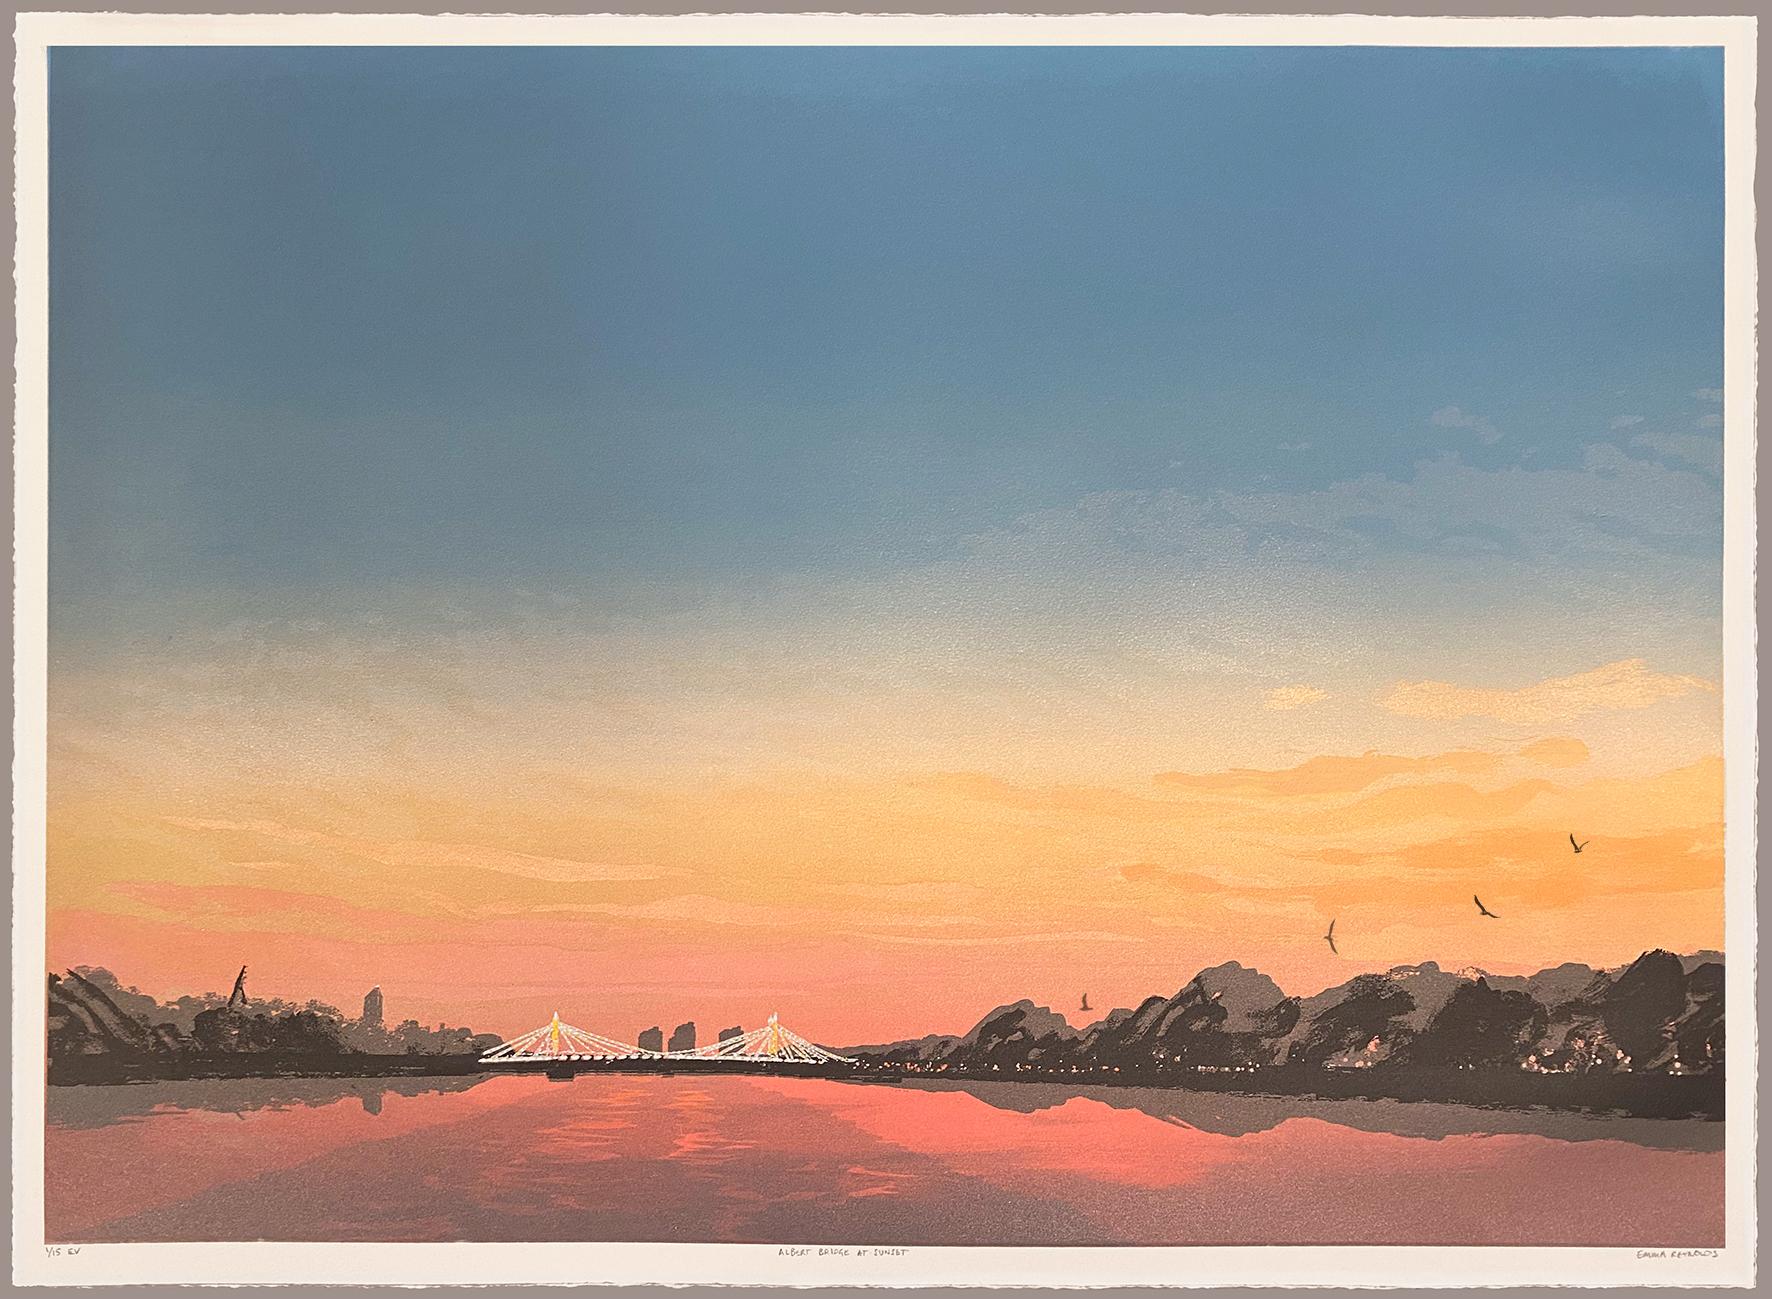 Albert Bridge, Sunset